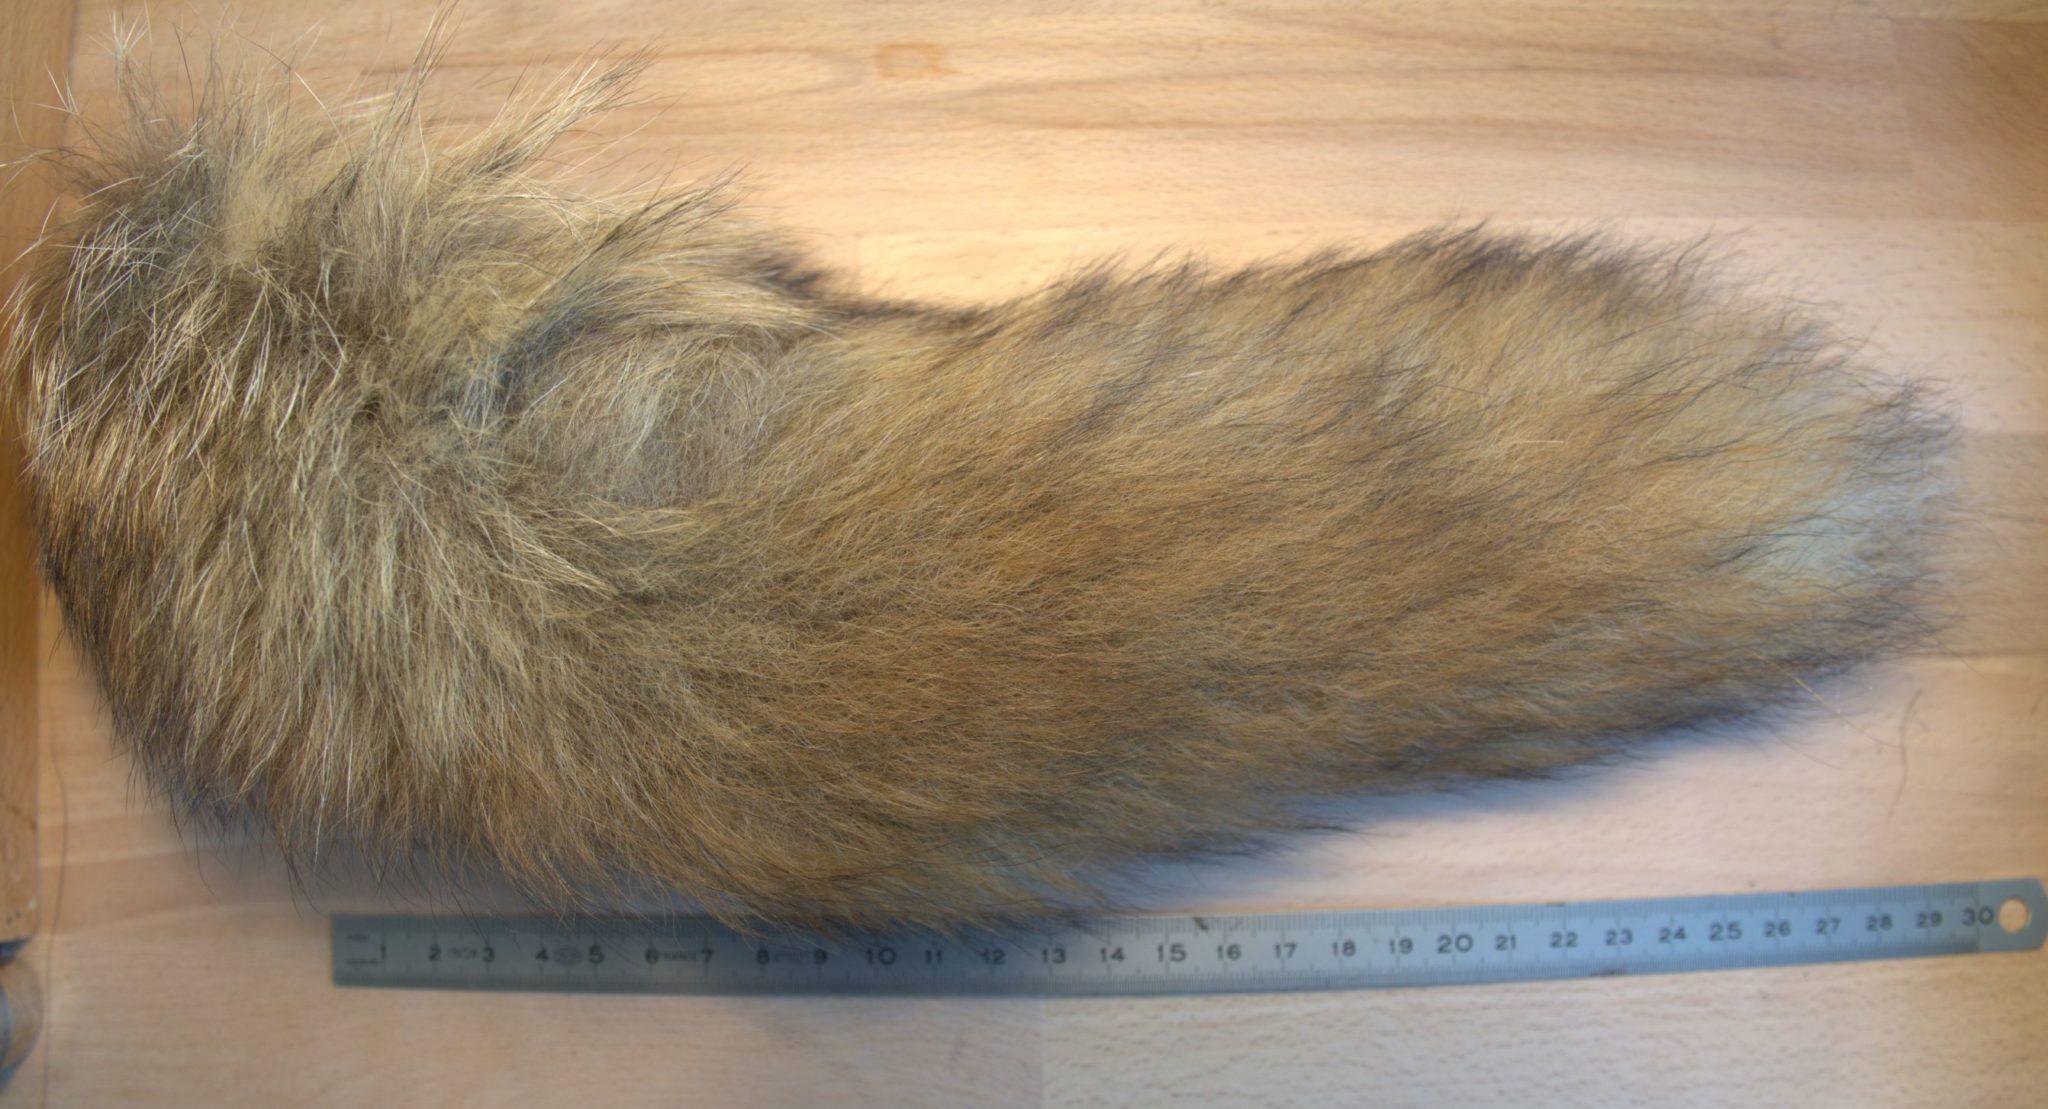 renard roux fox queue tail 2 fly tying flytying mouche eclosion fur poil saumon salmon seatrout truite de mer